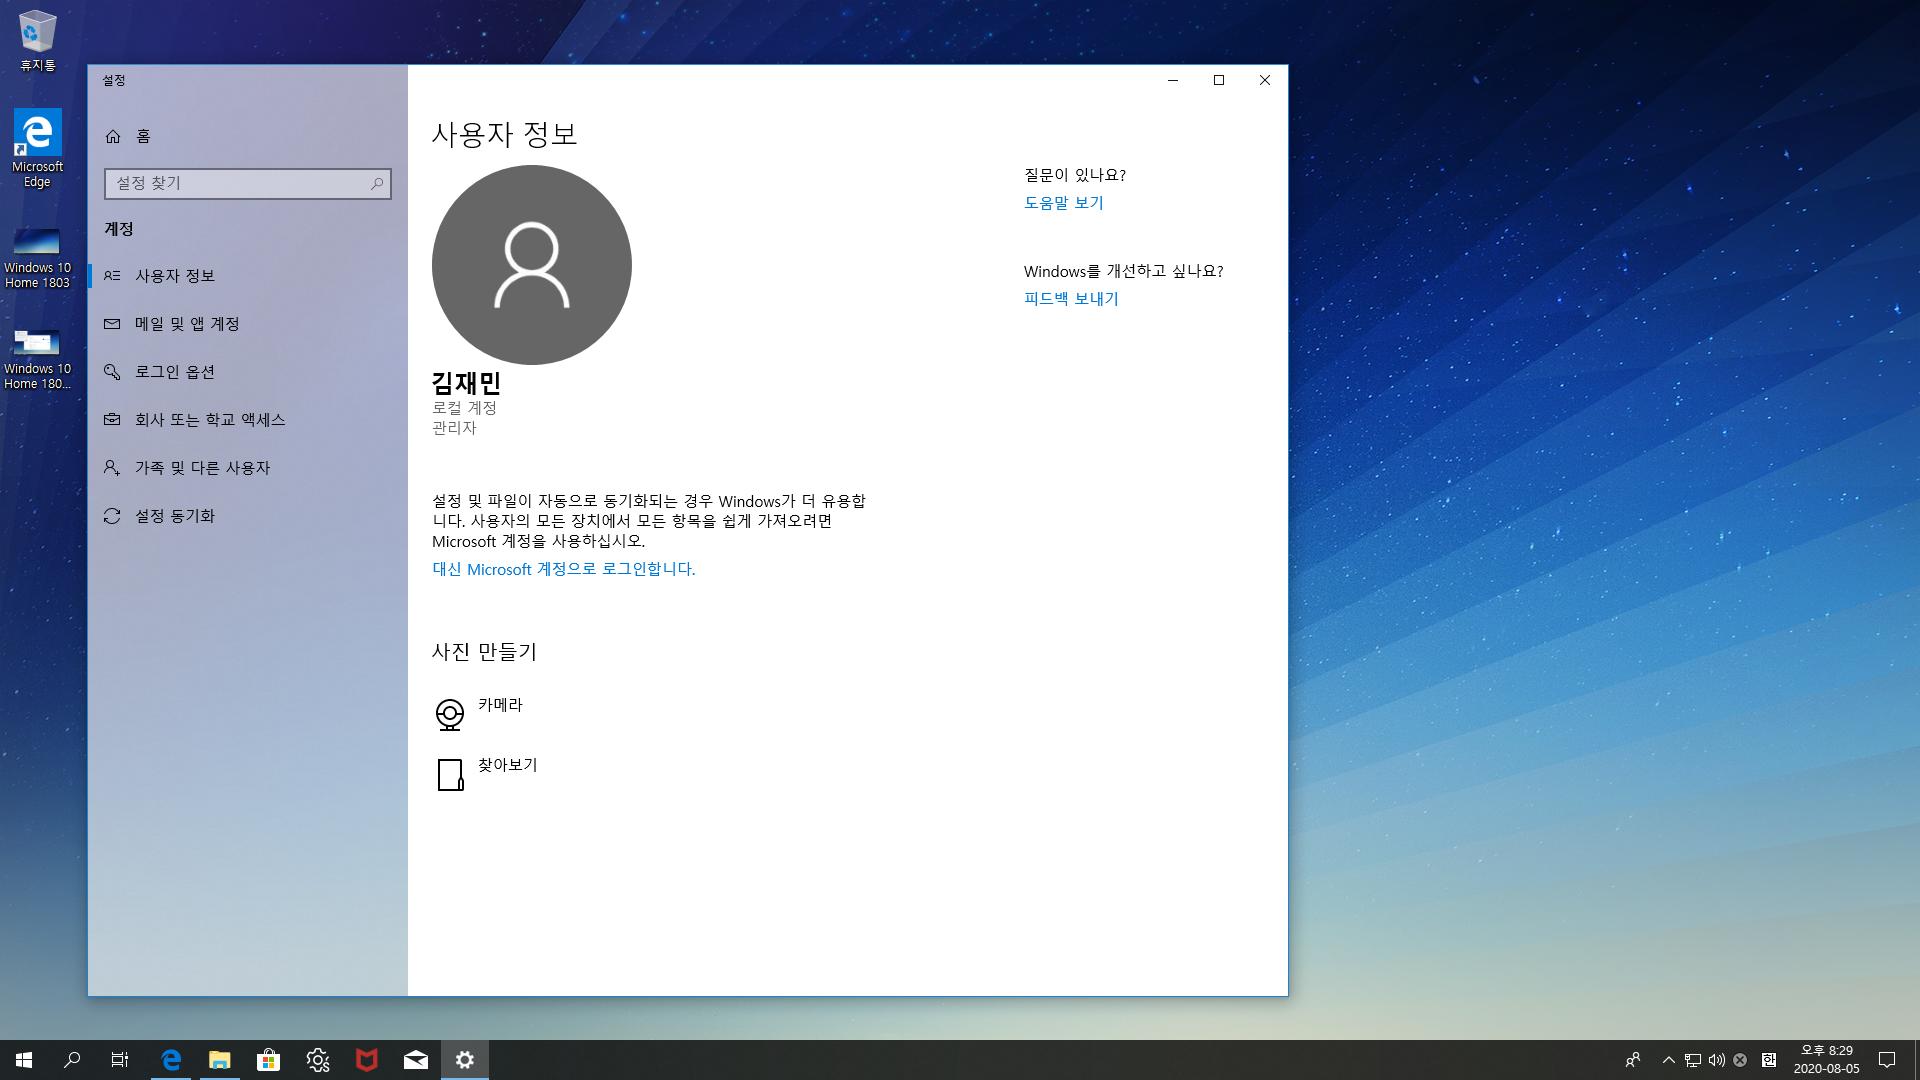 Windows 10 Home 1803 사용자 정보.png